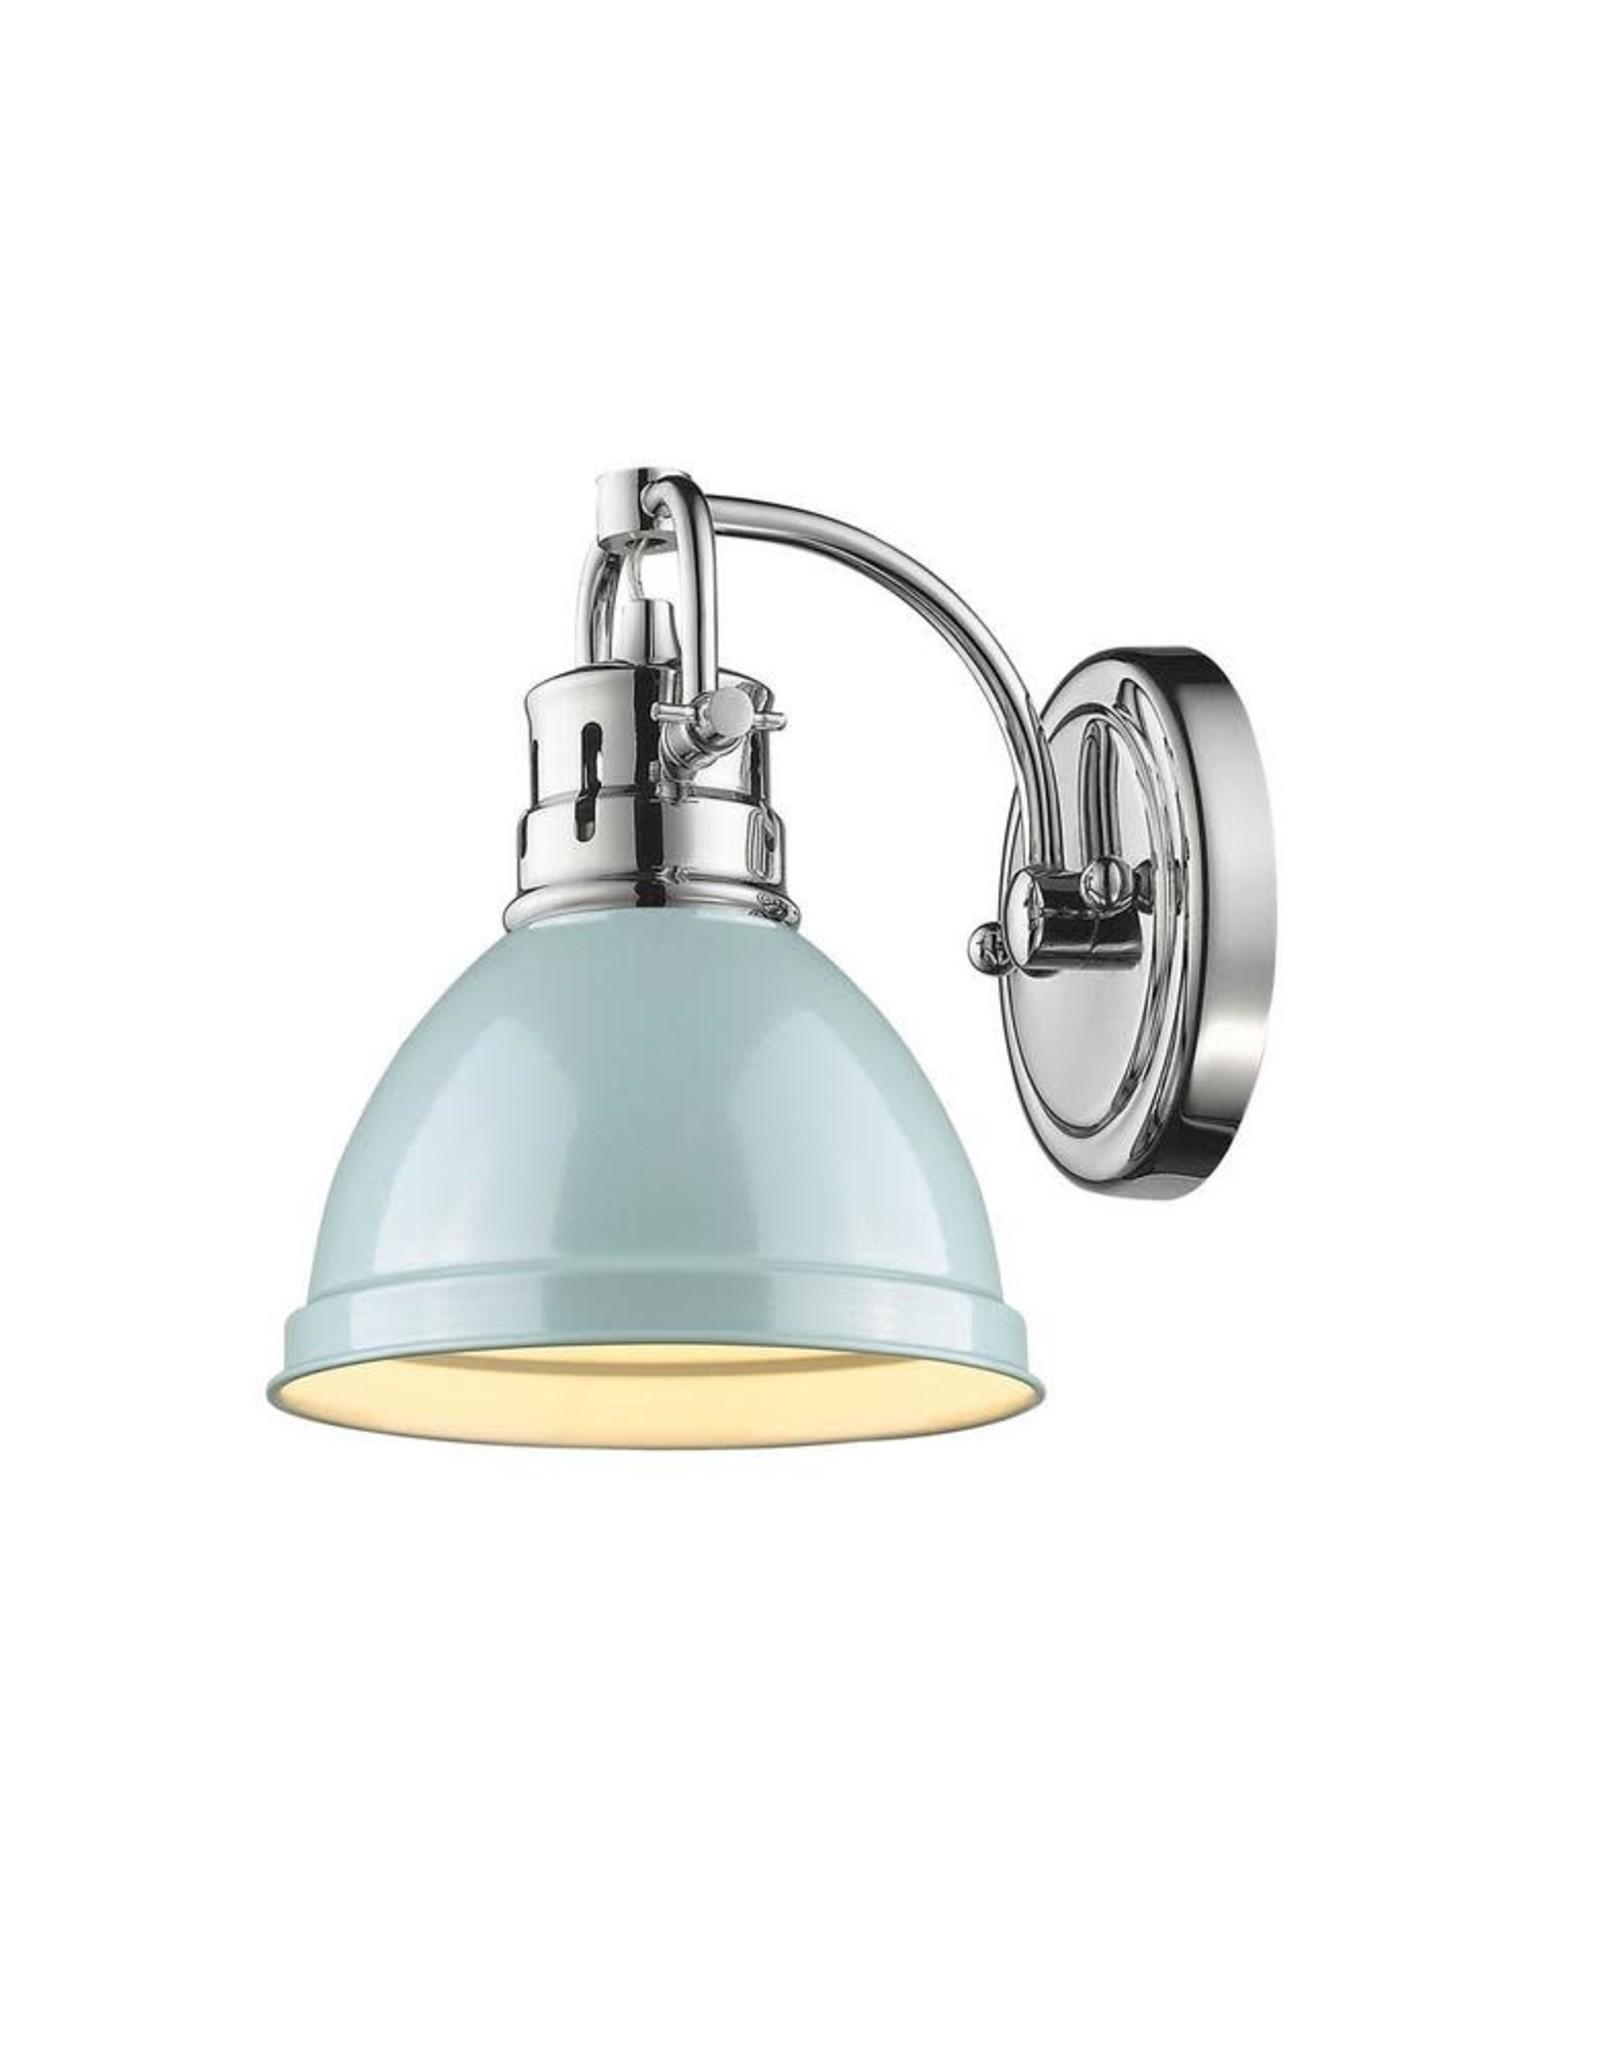 Golden Lighting Duncan Chrome 1-Light Bath Light with Seafoam Shade